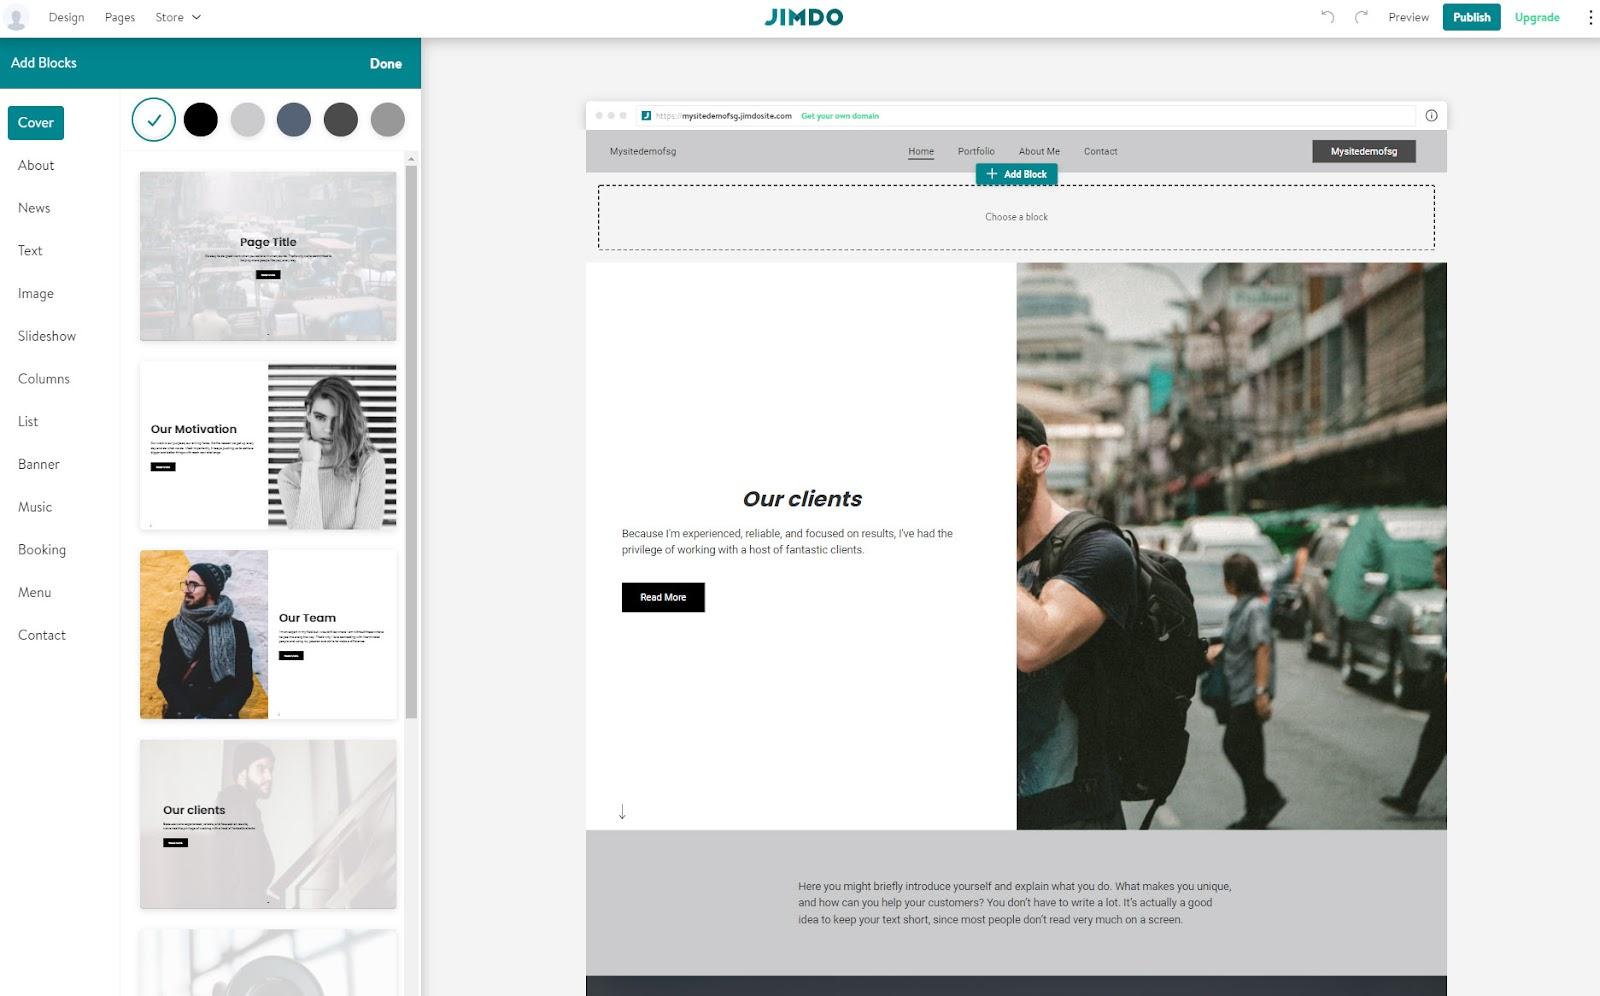 jimdo design flexibility